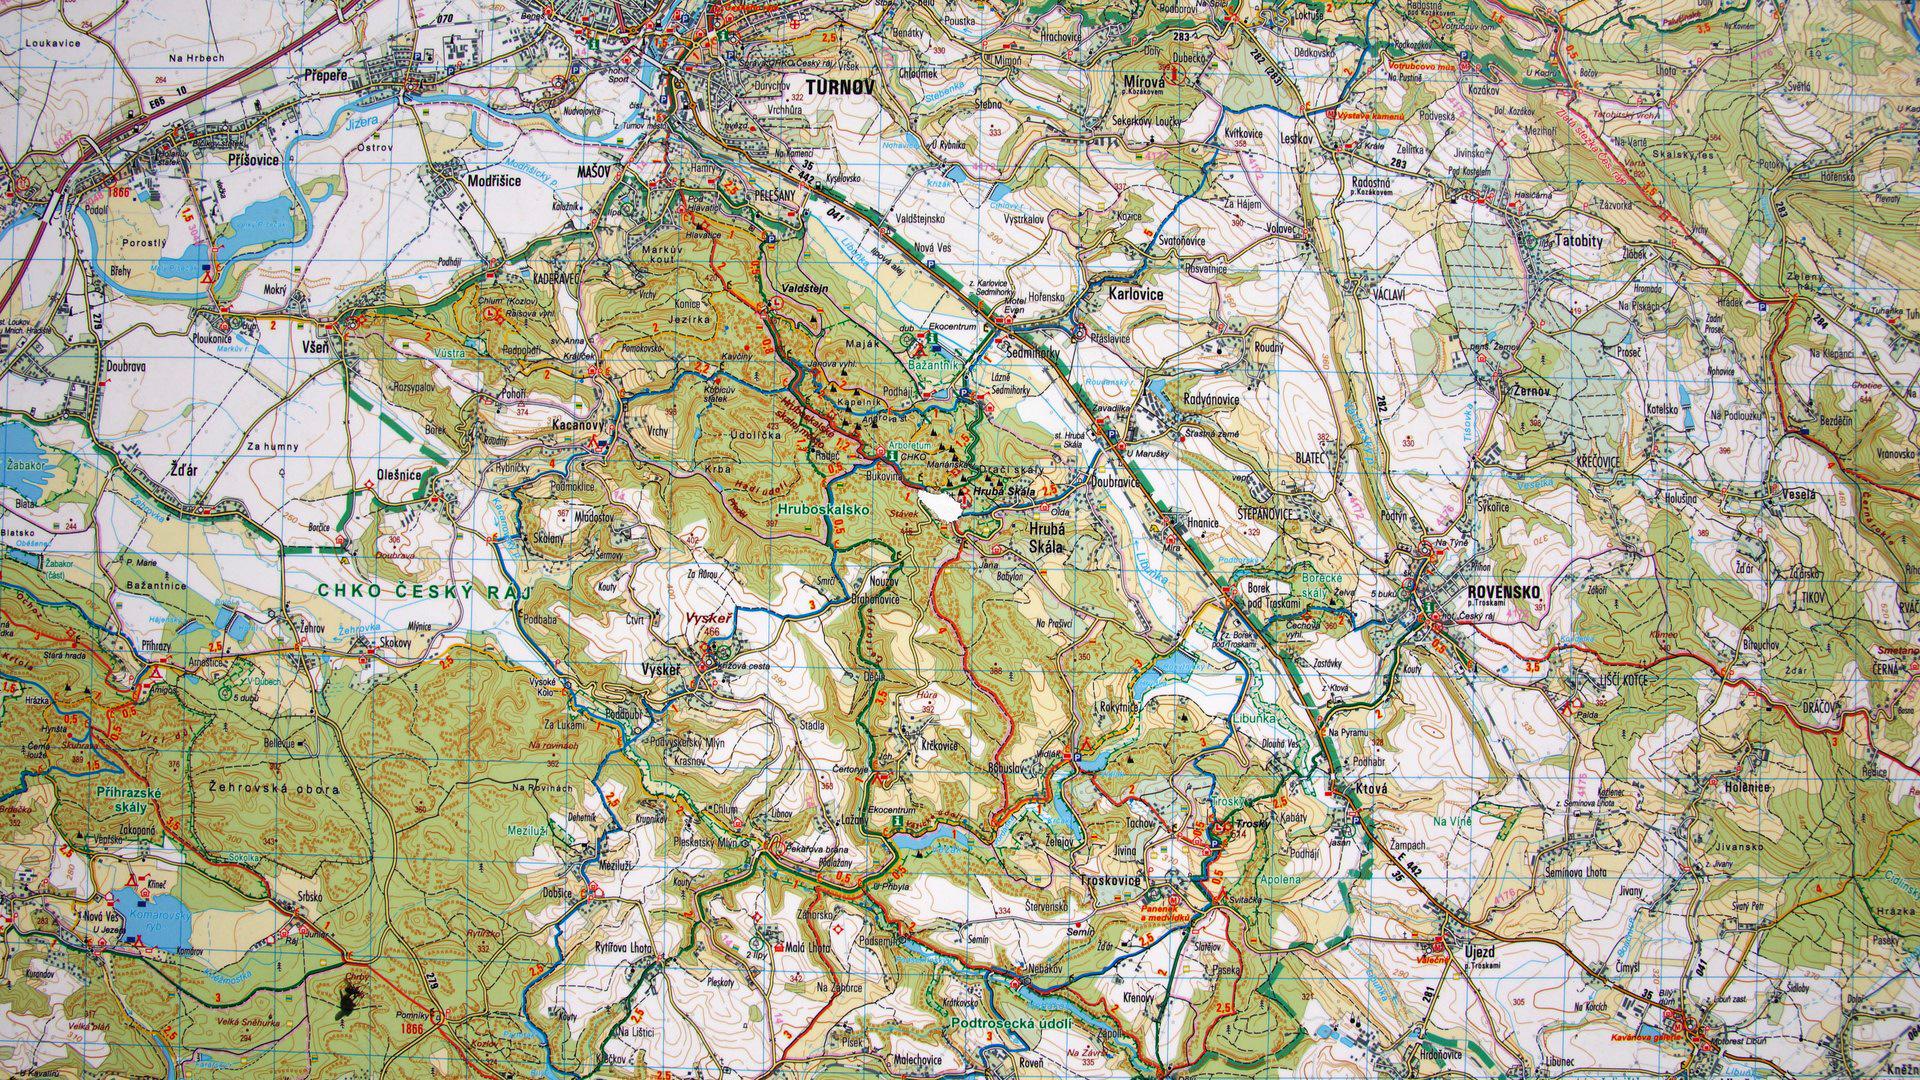 Czeski Raj - cesky raj - map